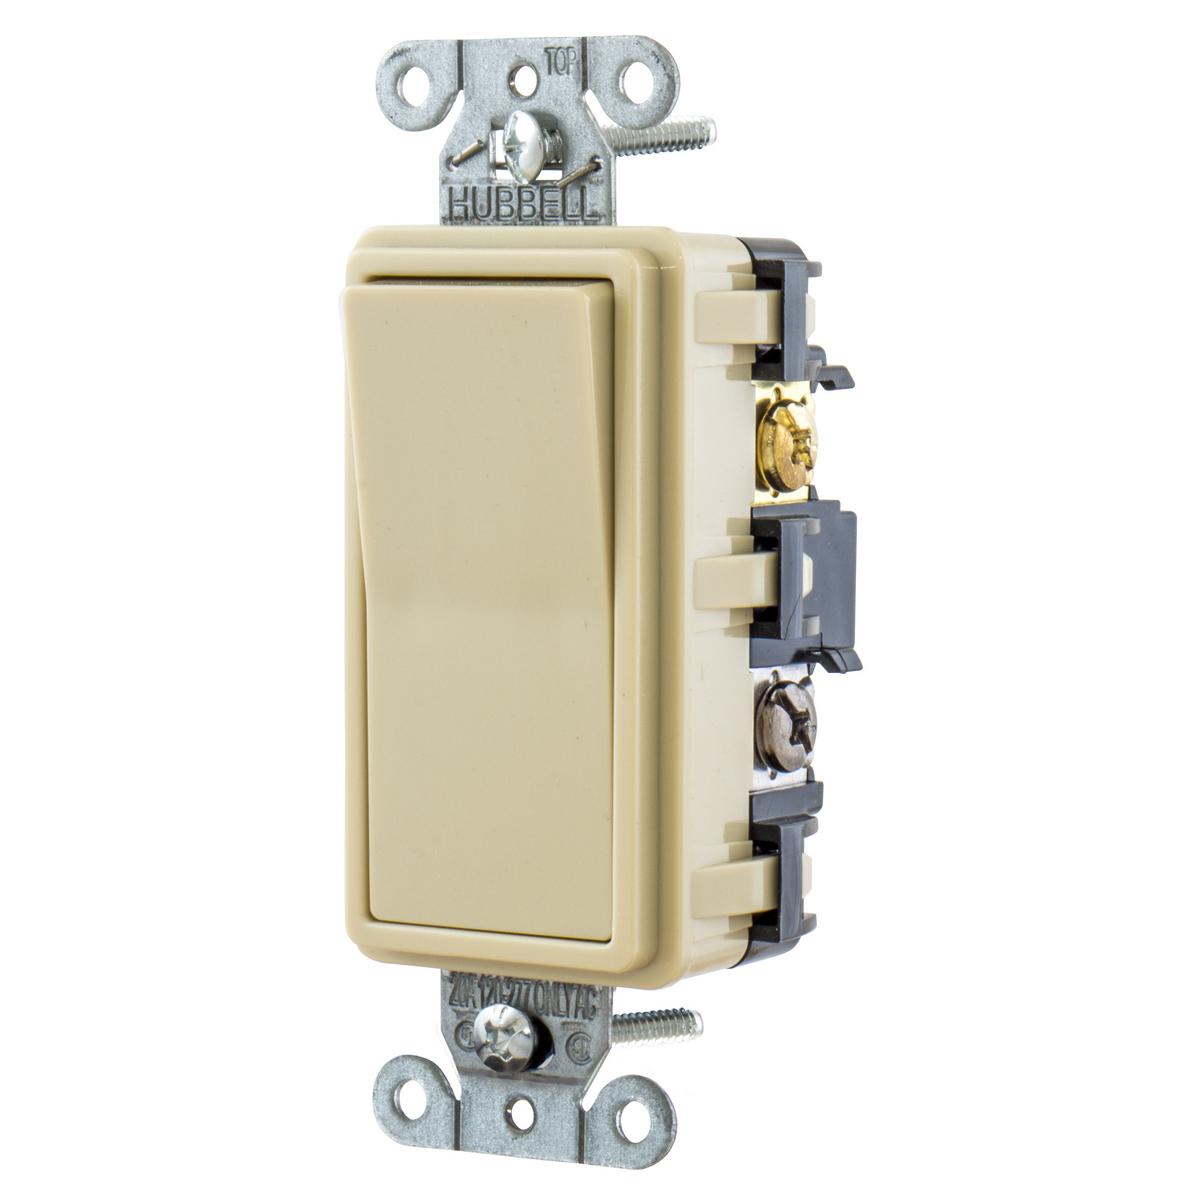 Hubbell RSD415I 15 Amp 120/277 VAC 4-Way Ivory Rocker Switch